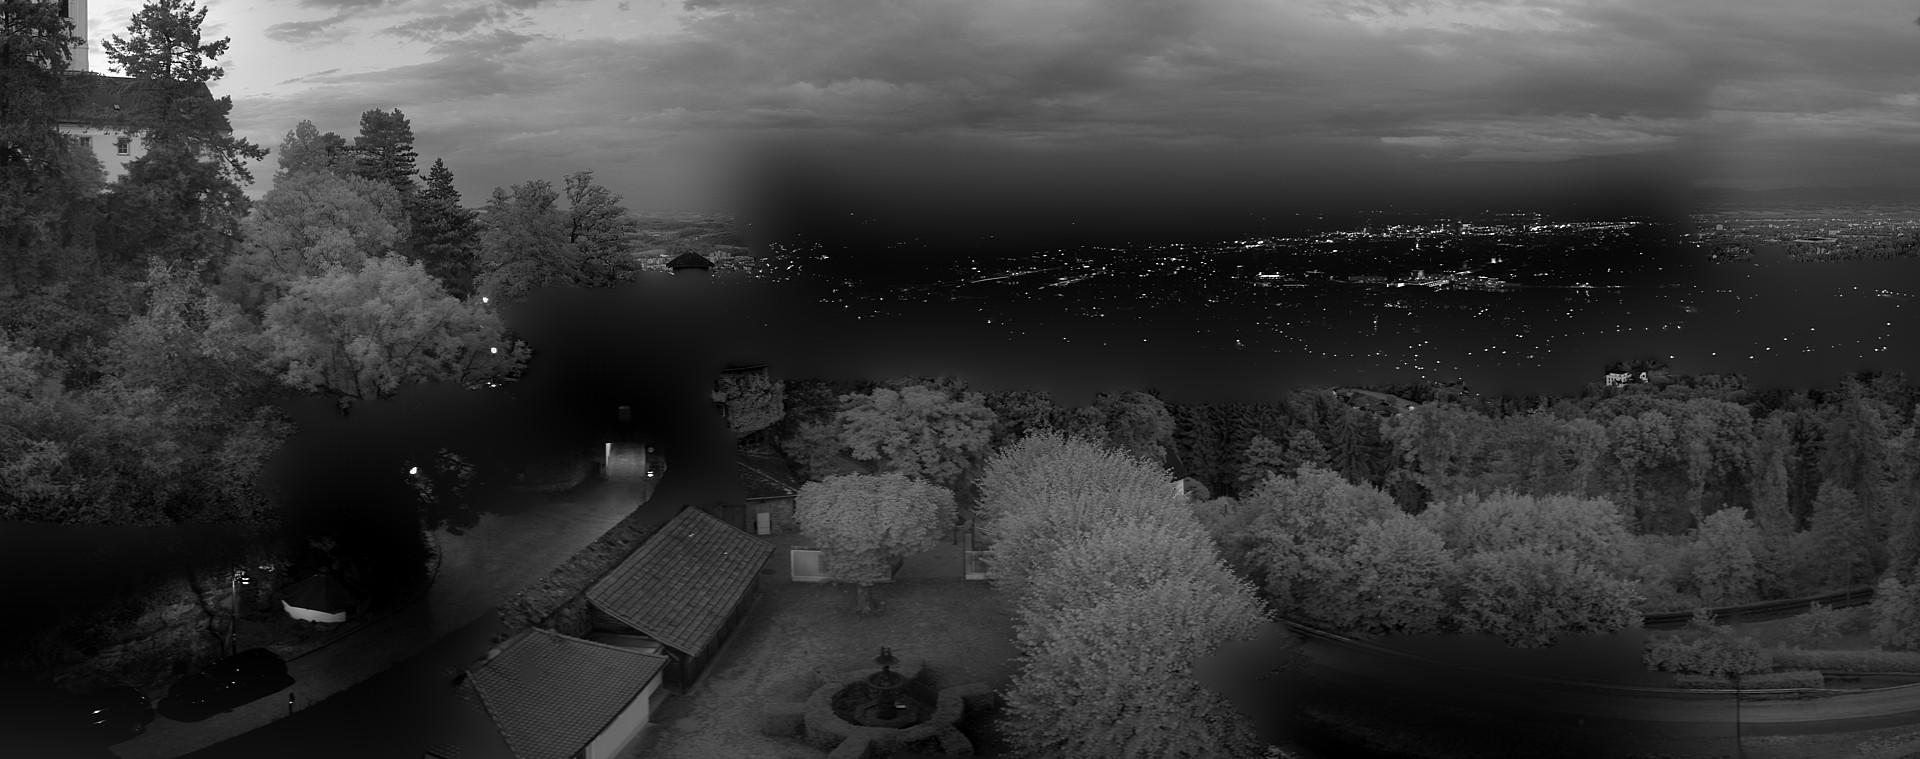 Webcam Panorama Pöstlingberg Schlössl